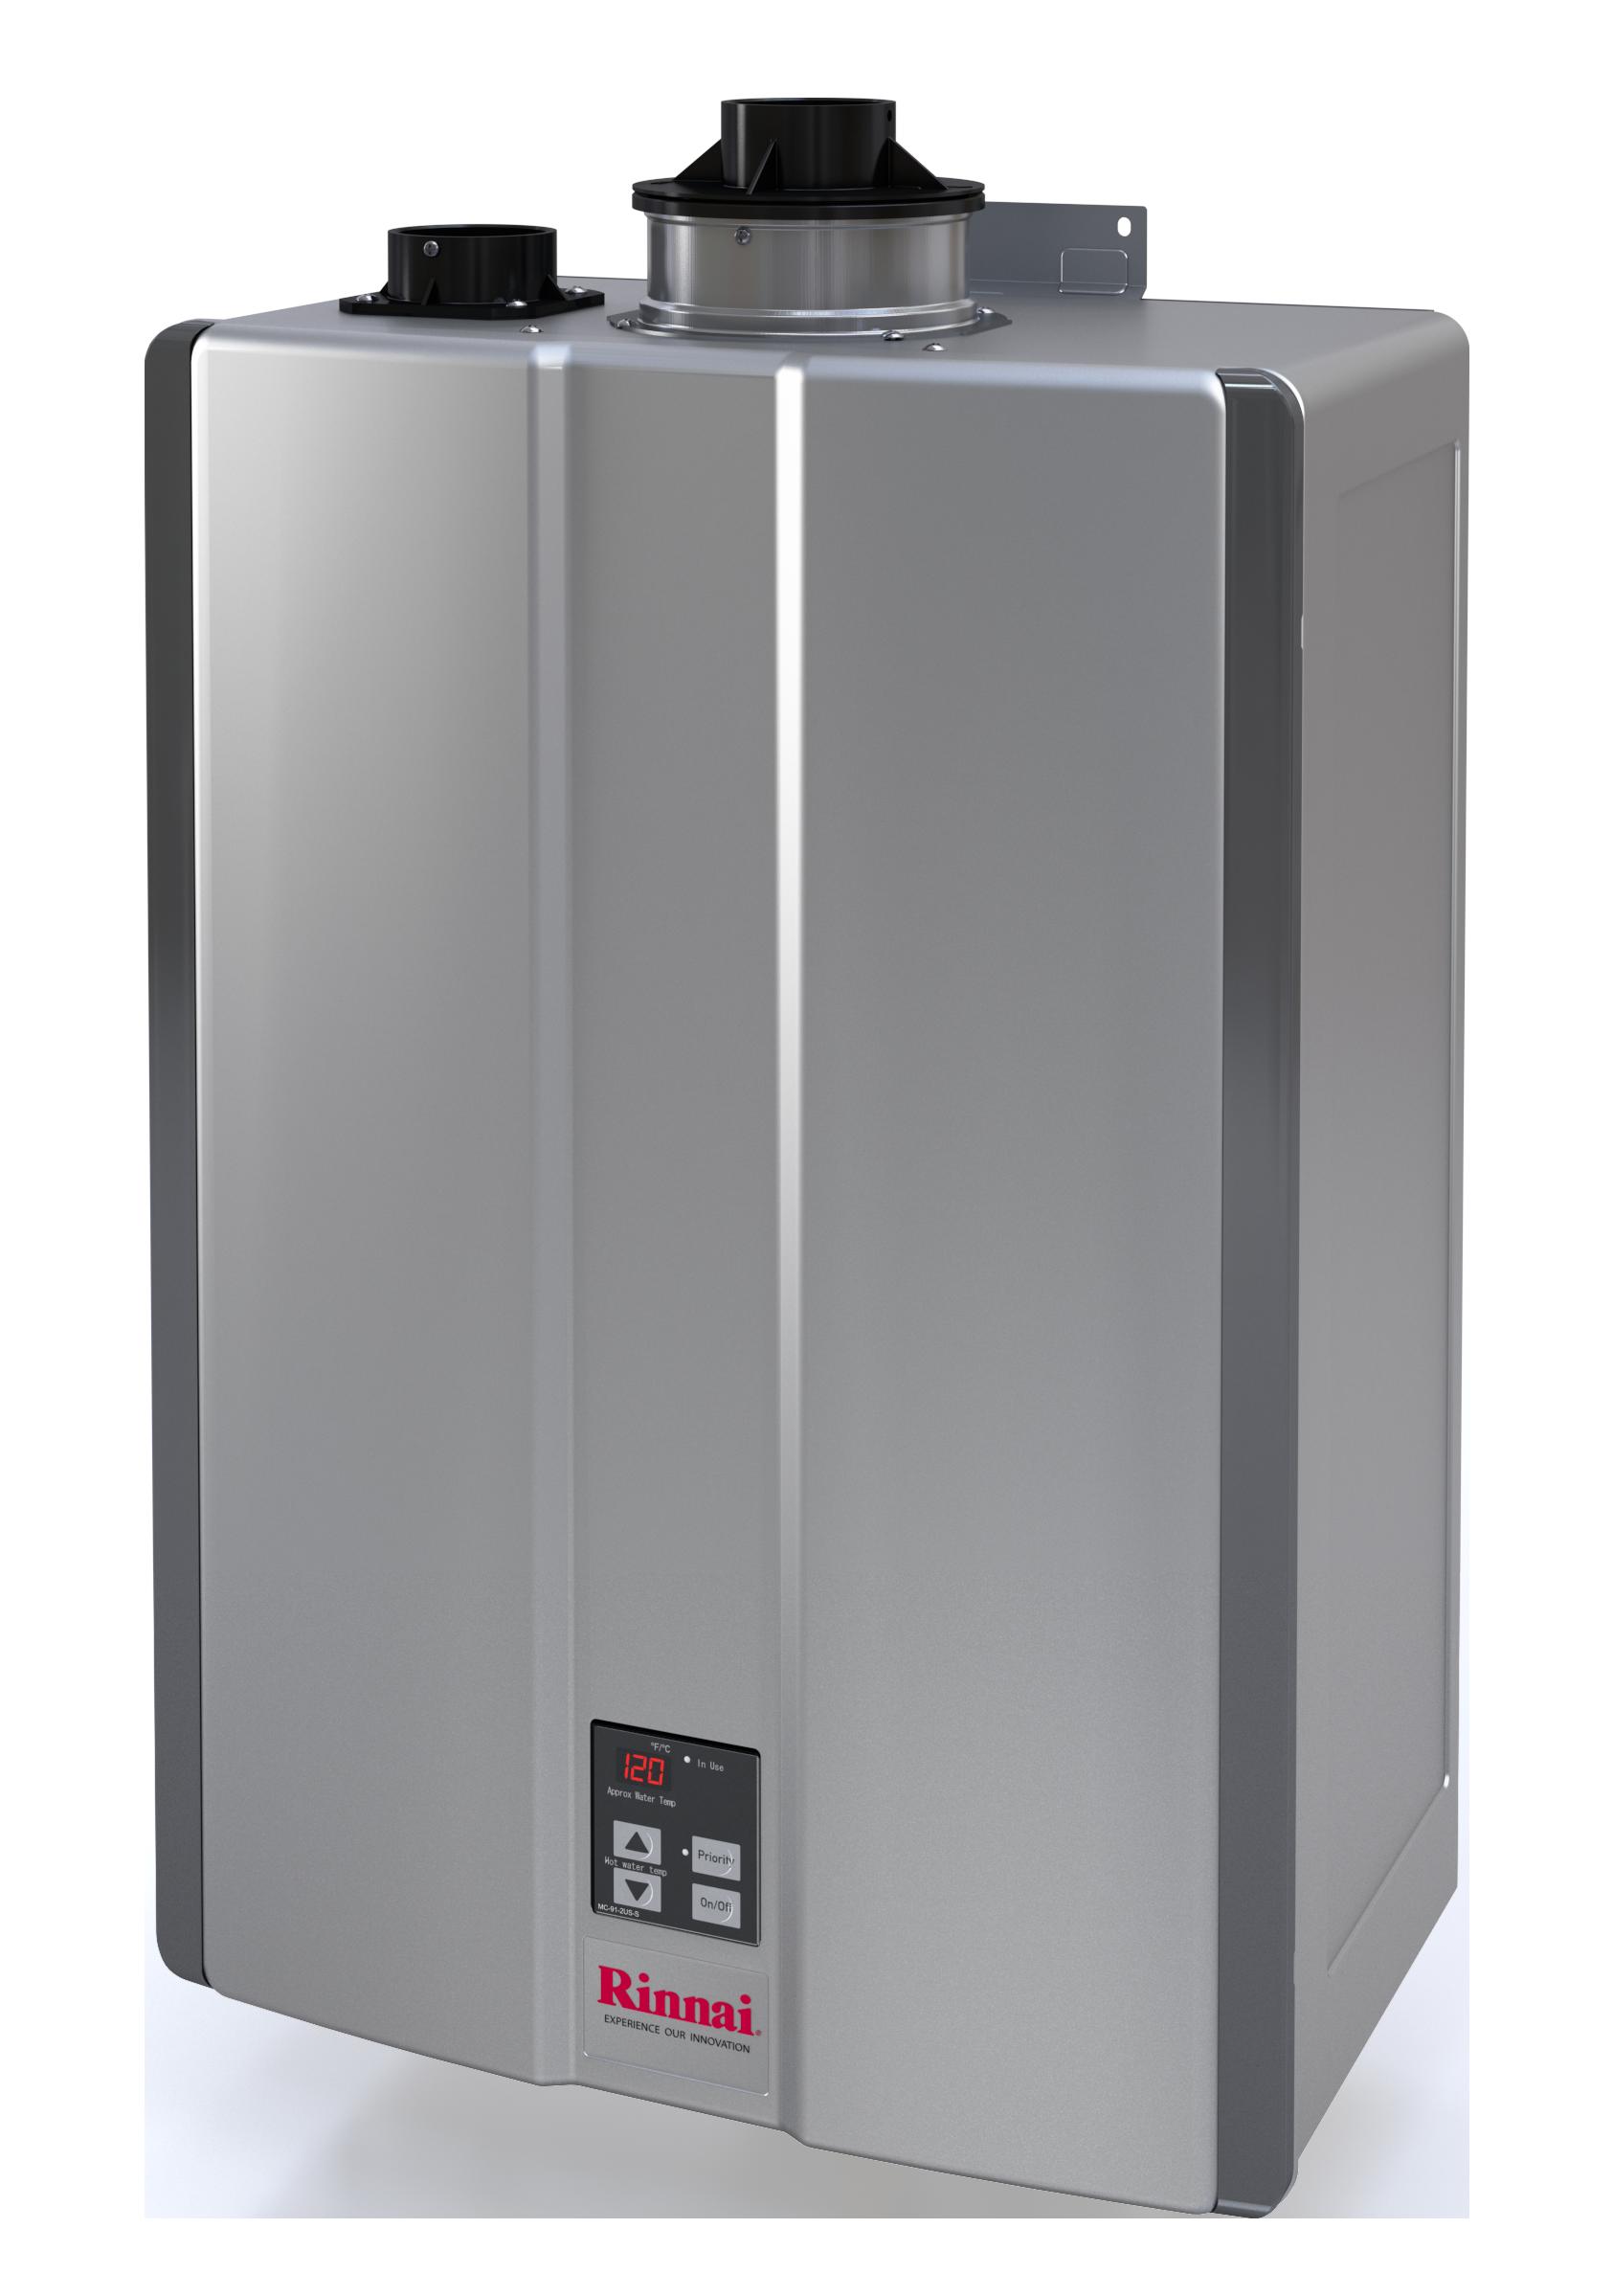 Rur160in Tankless Water Heater Rinnai America